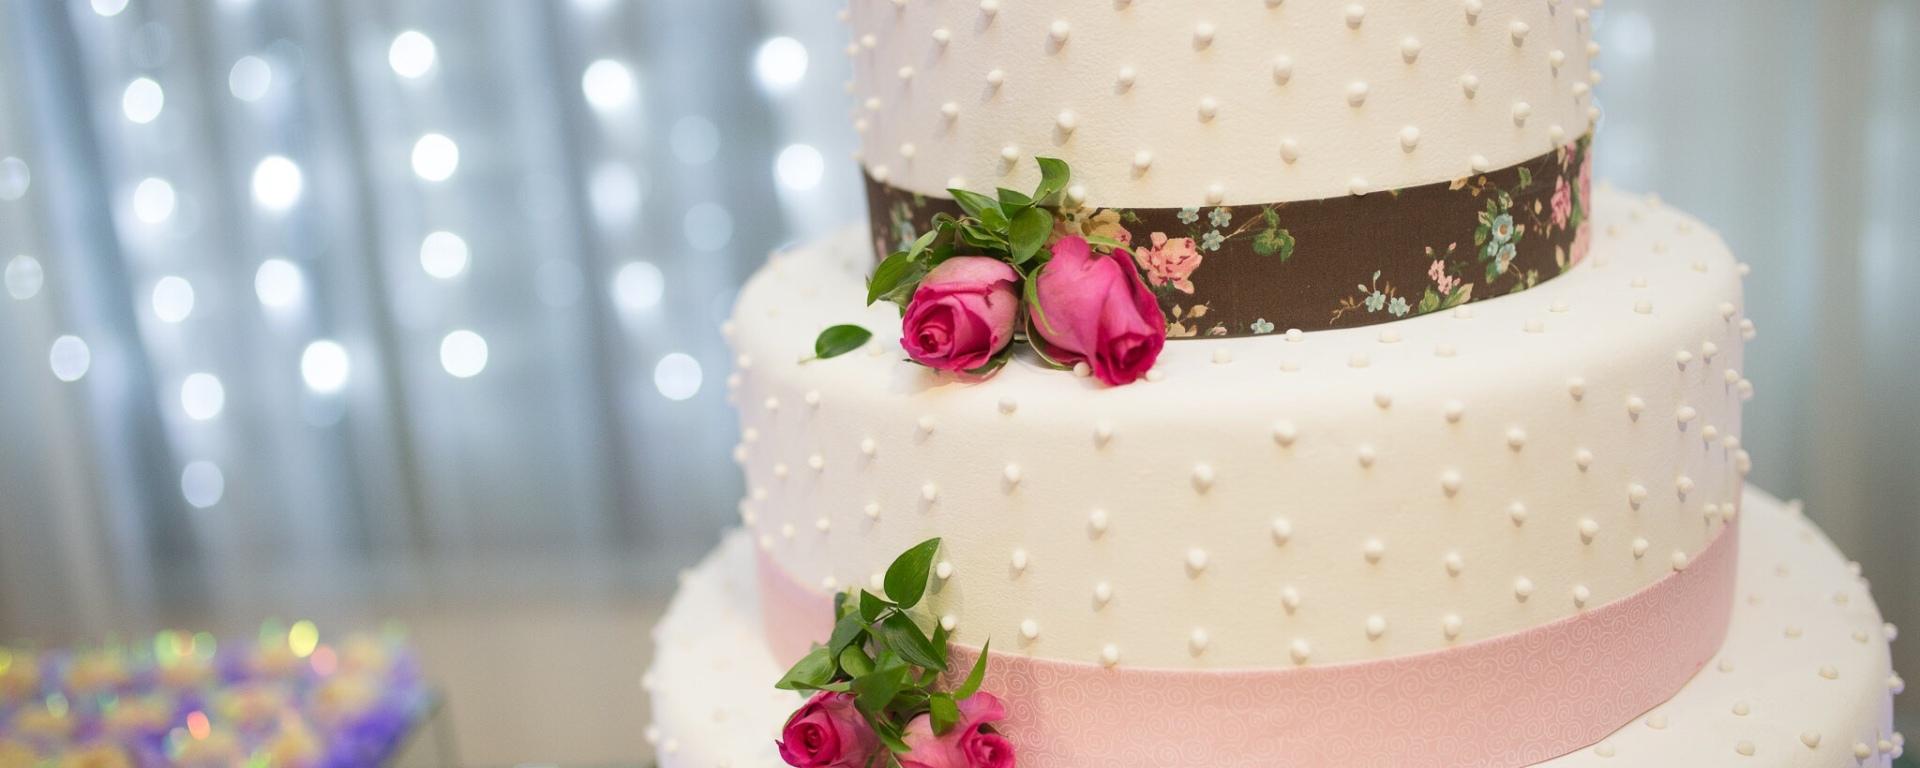 Romantic Birthday Cake For Husband